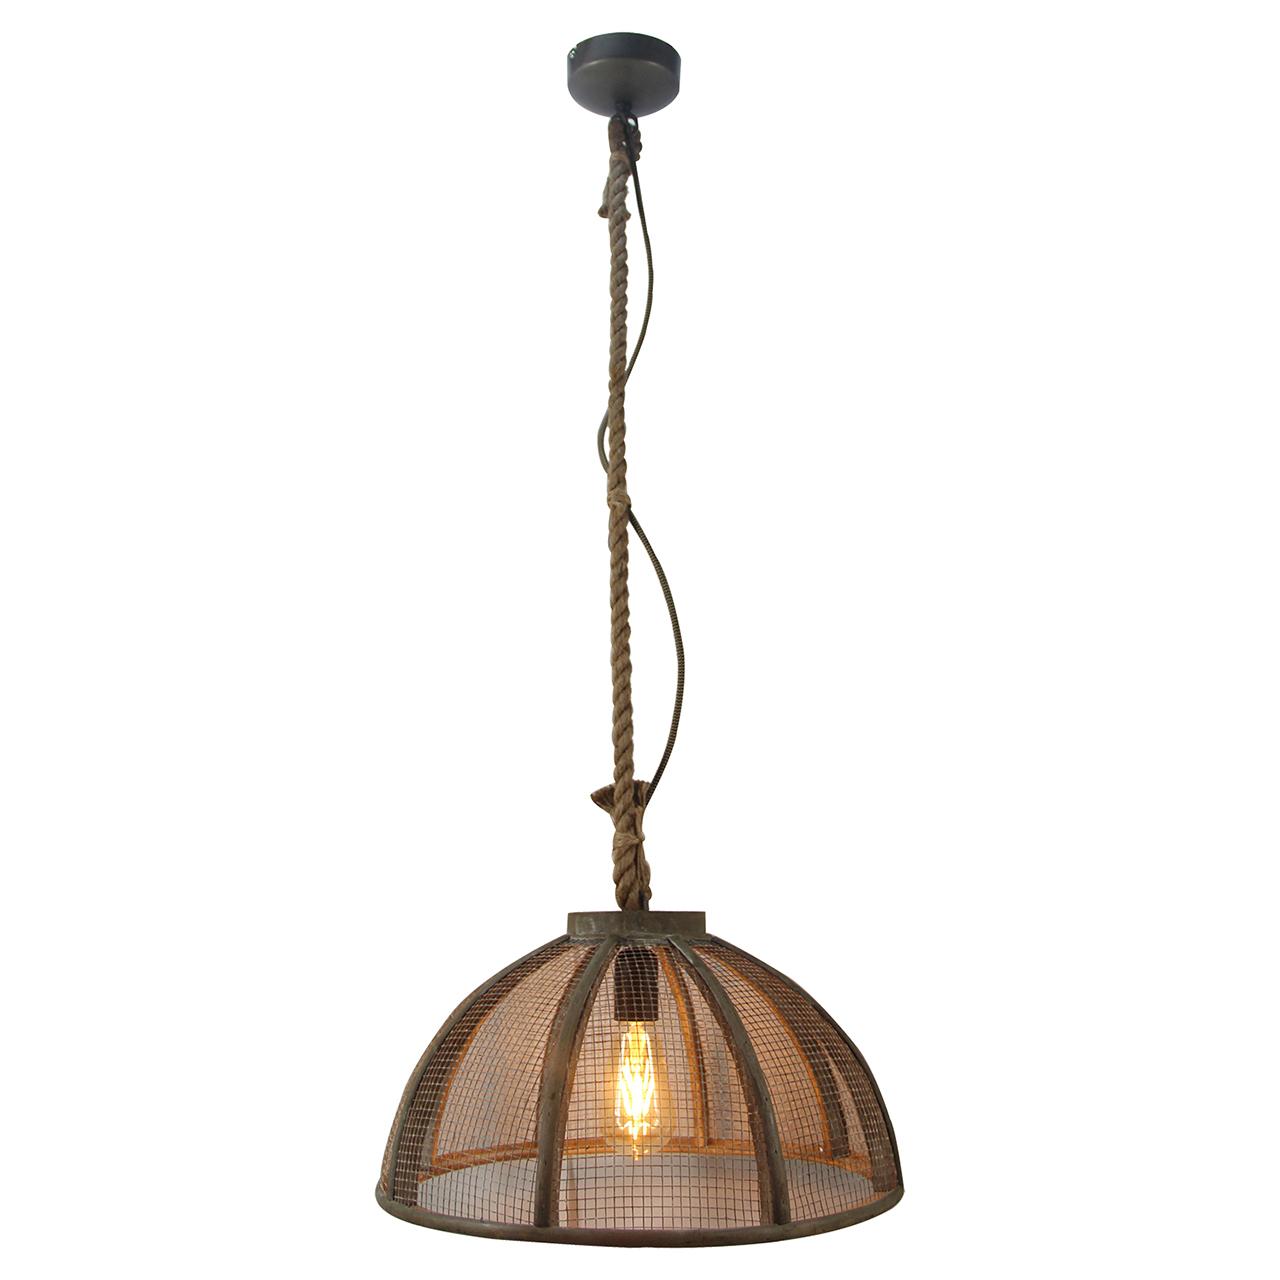 цена на Подвесной светильник Lussole Loft Mirta LSP-9806